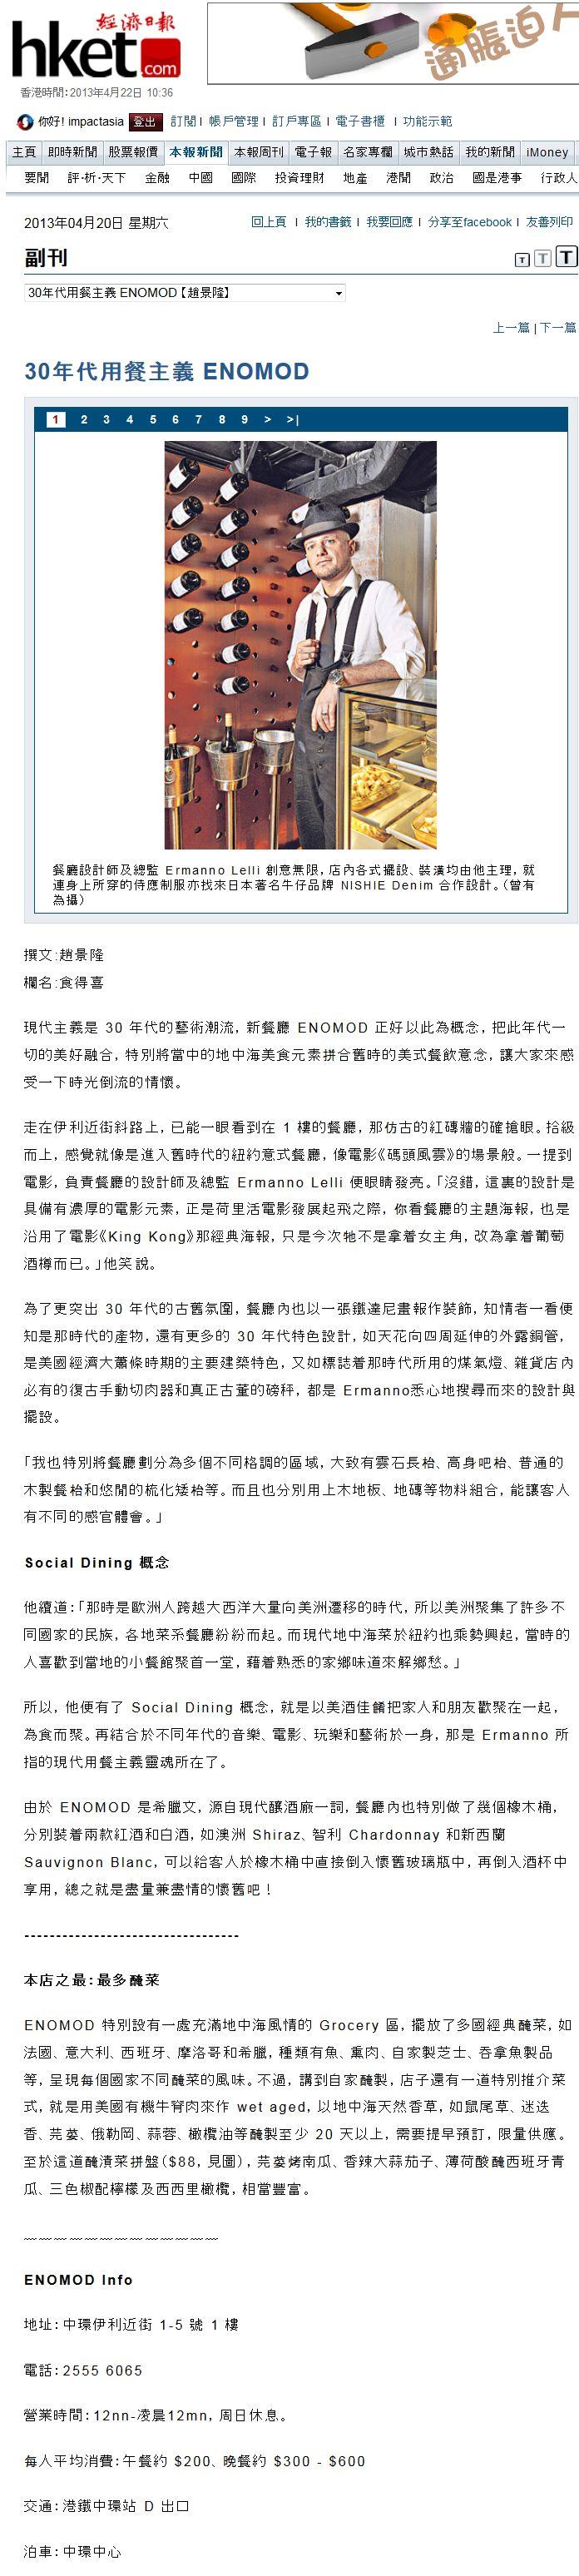 ENOMOD - 20.04 - Hong Kong Economic Times (online).jpg